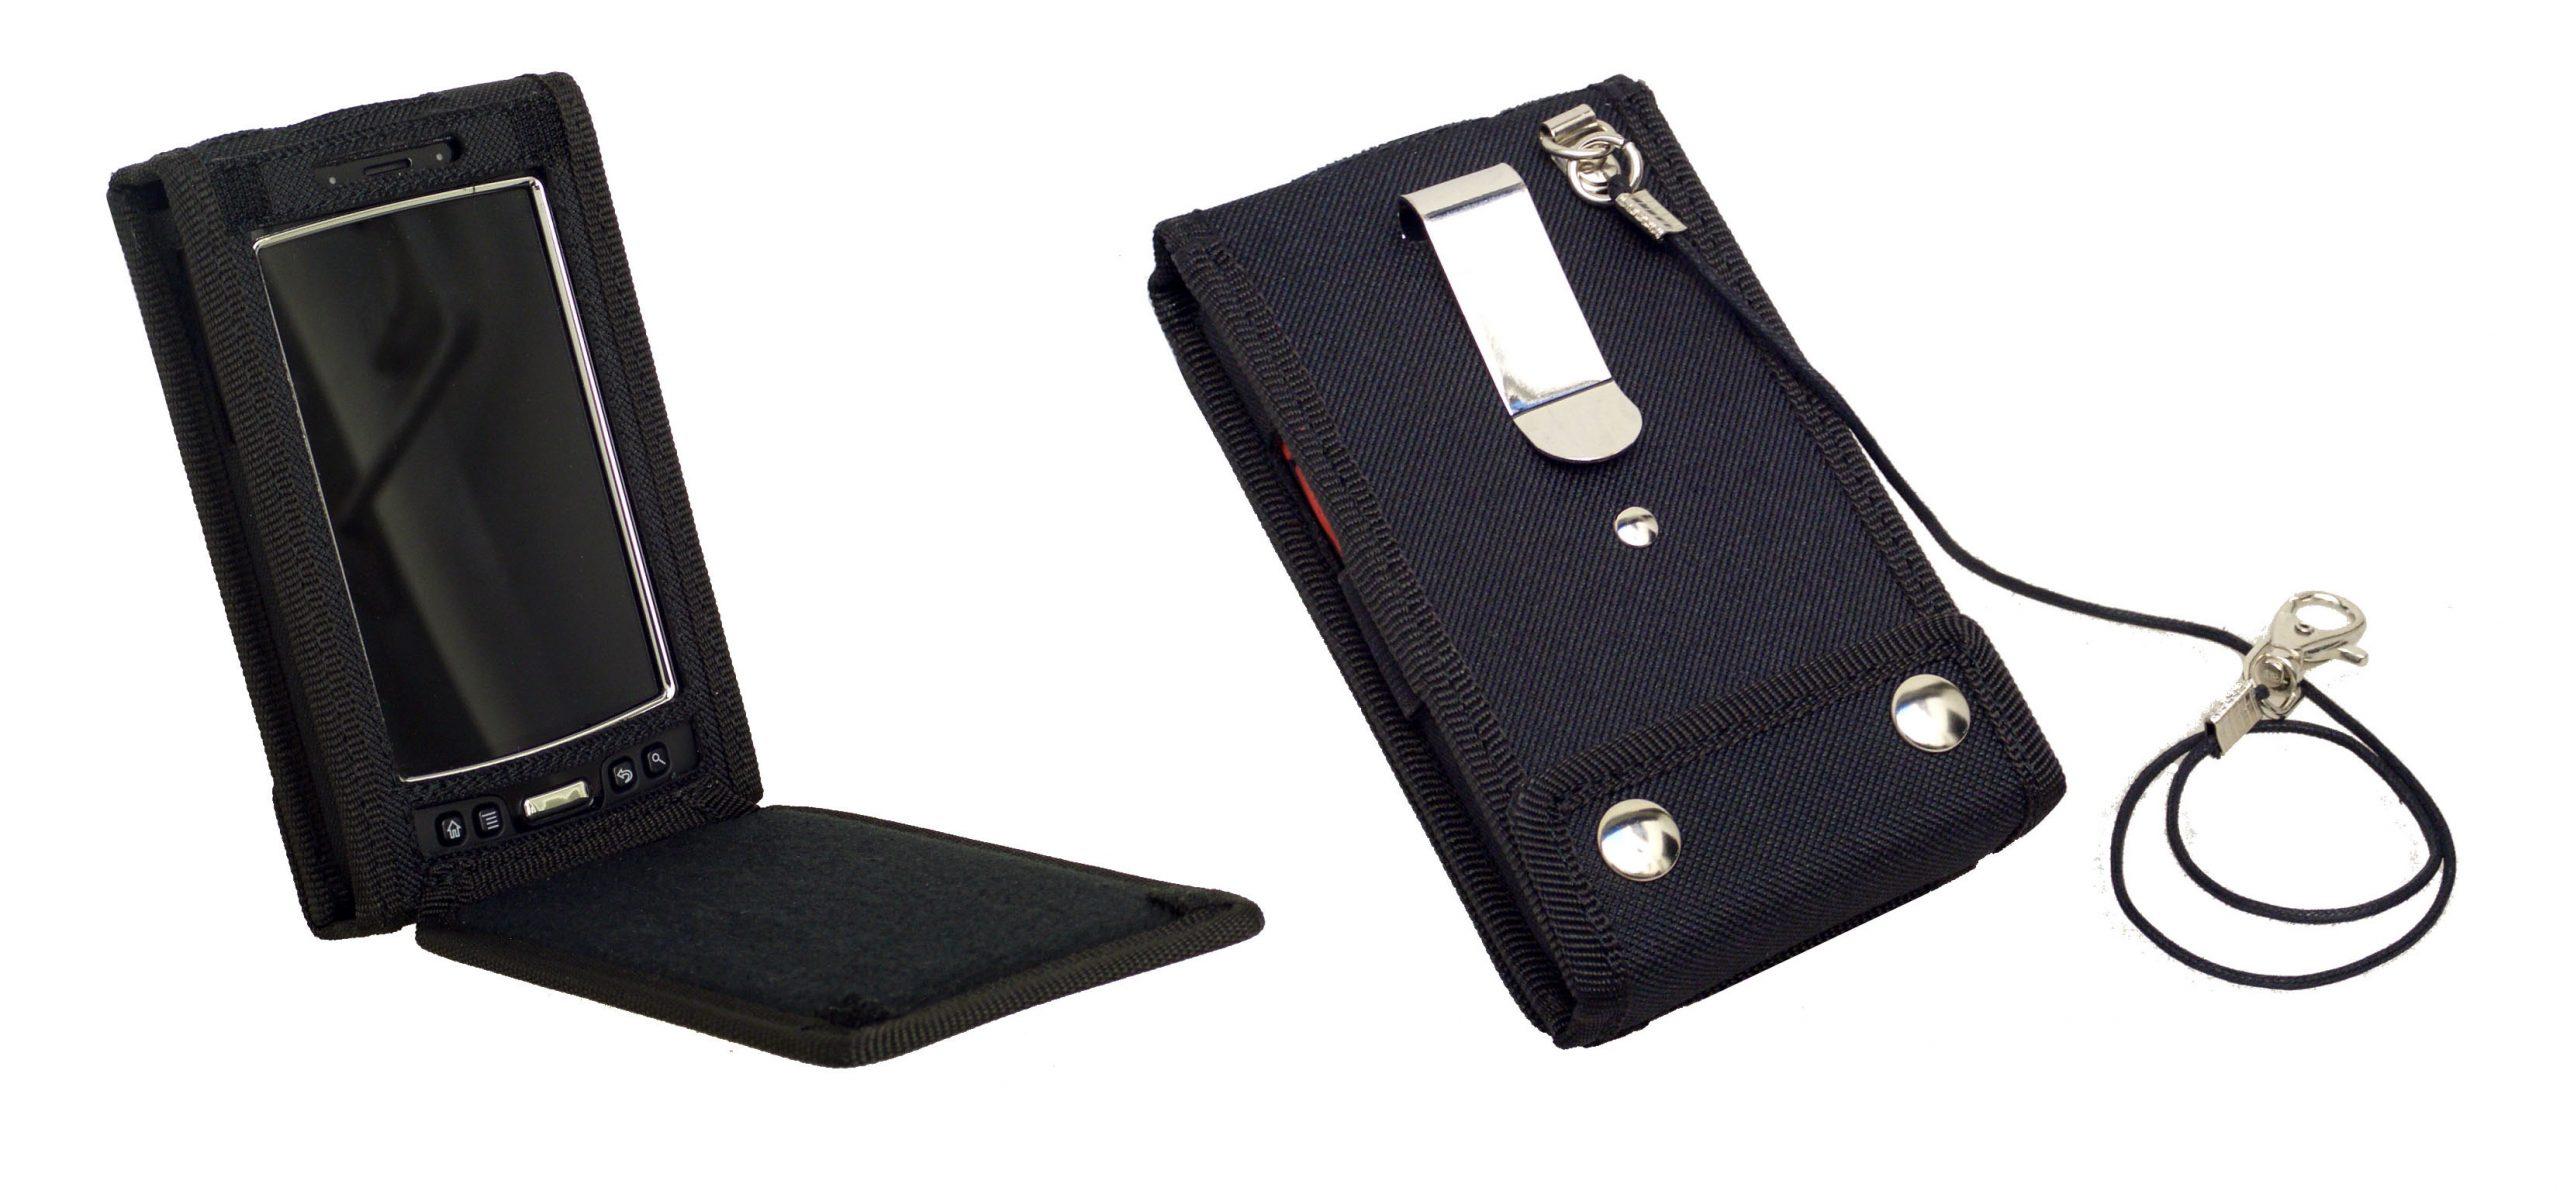 Honeywell Dolphin 70e Black Nylon case